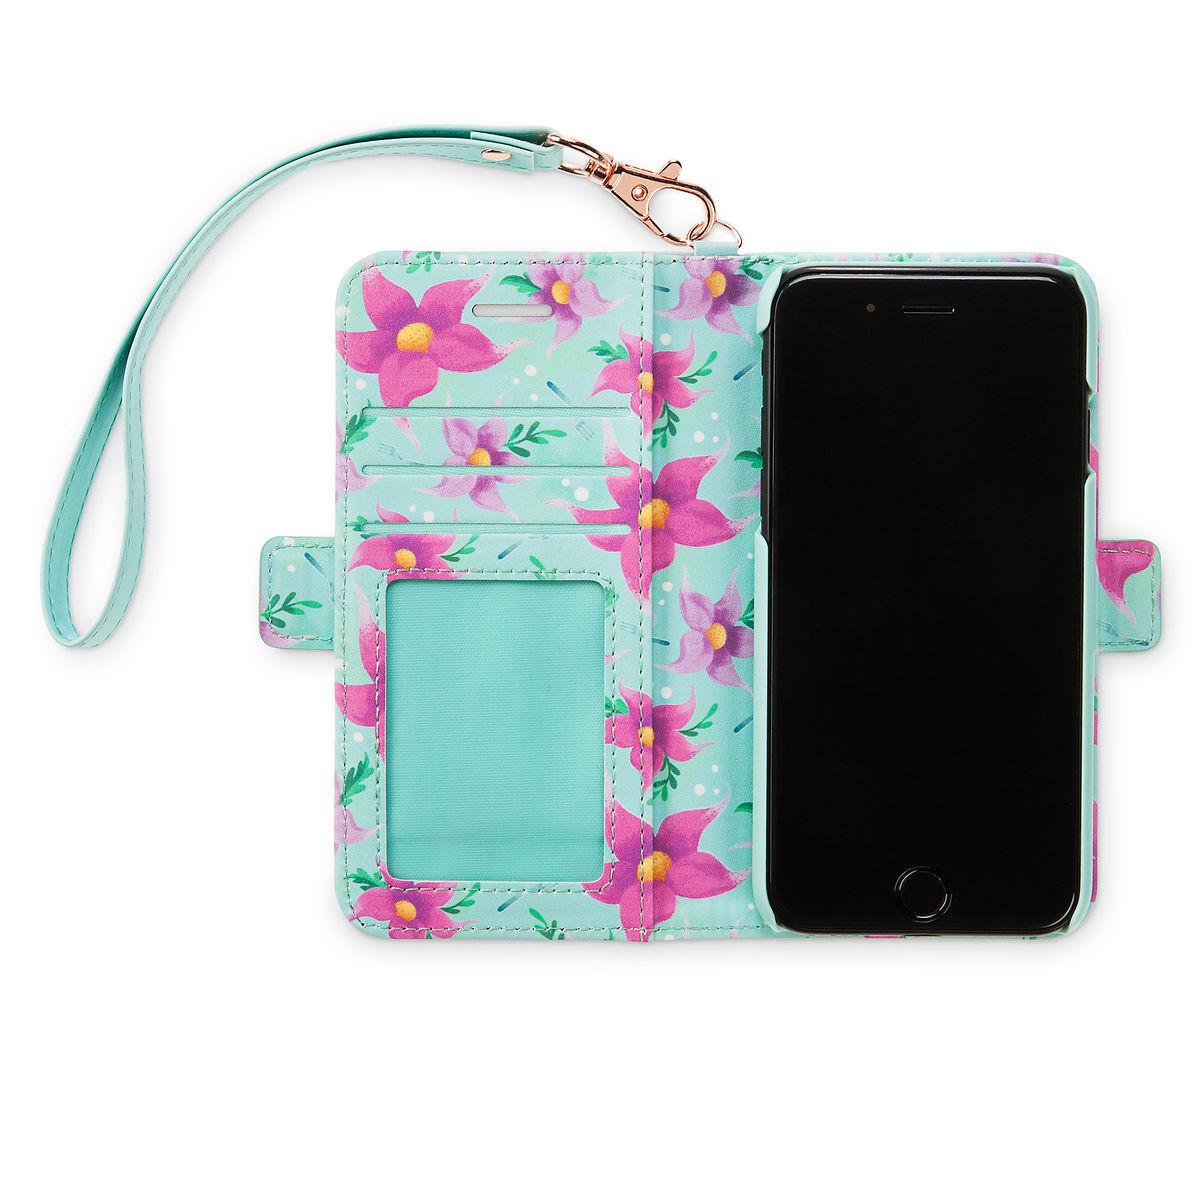 DISNEY THE LITTLE MERMAID SWEET 2 iphone case